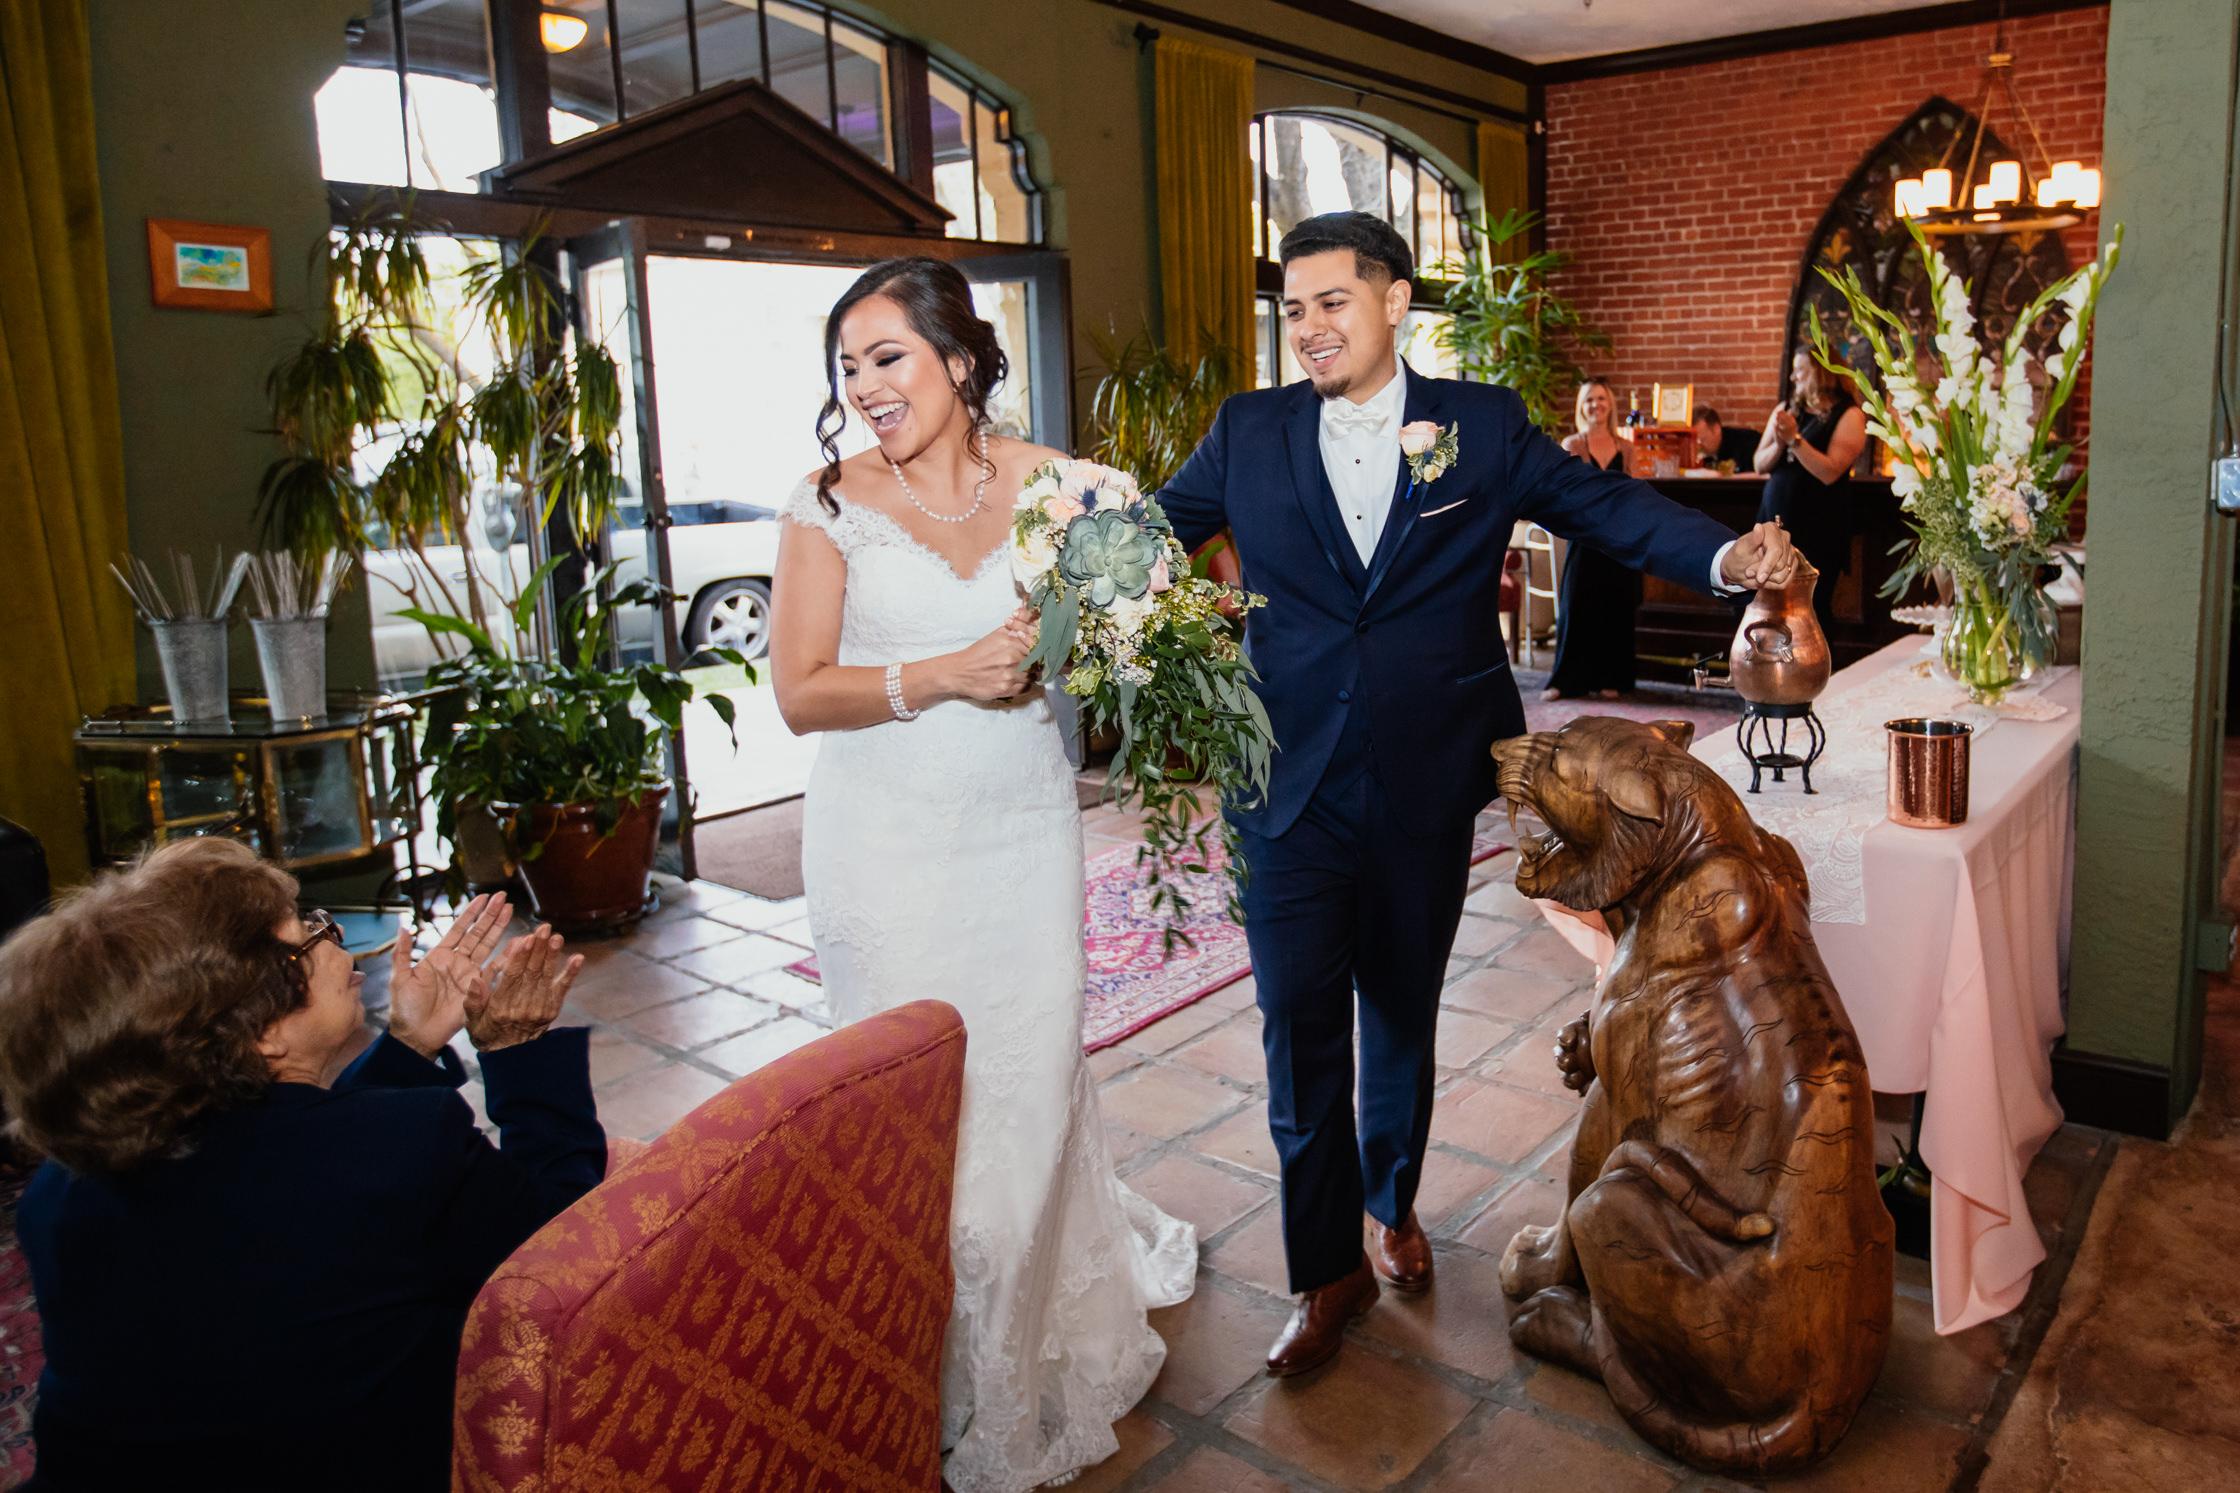 luis_joanna_wedding-78.jpg